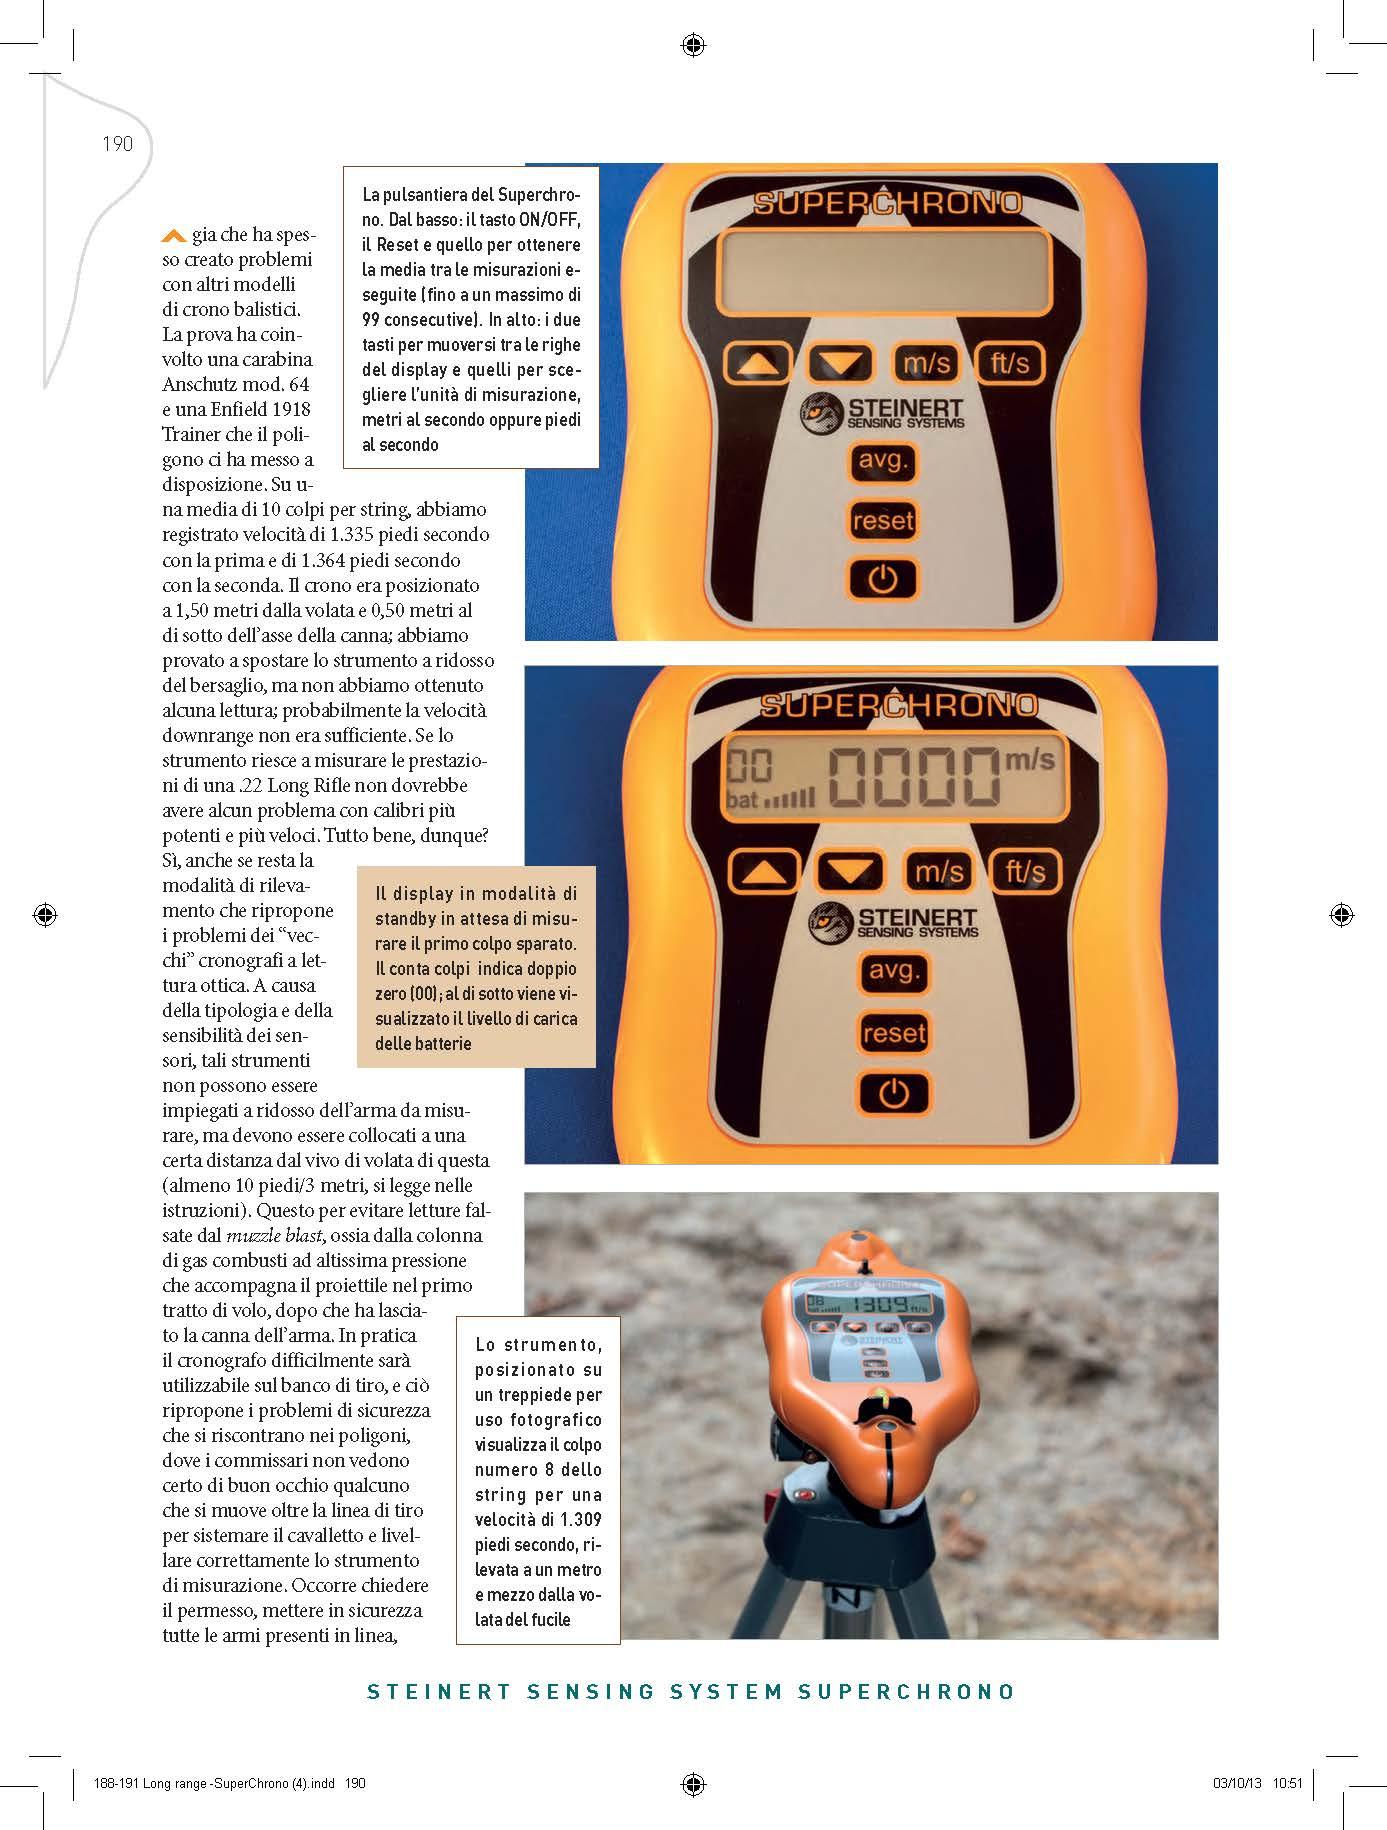 Armi Magazine November 2013 (3)_Page_3